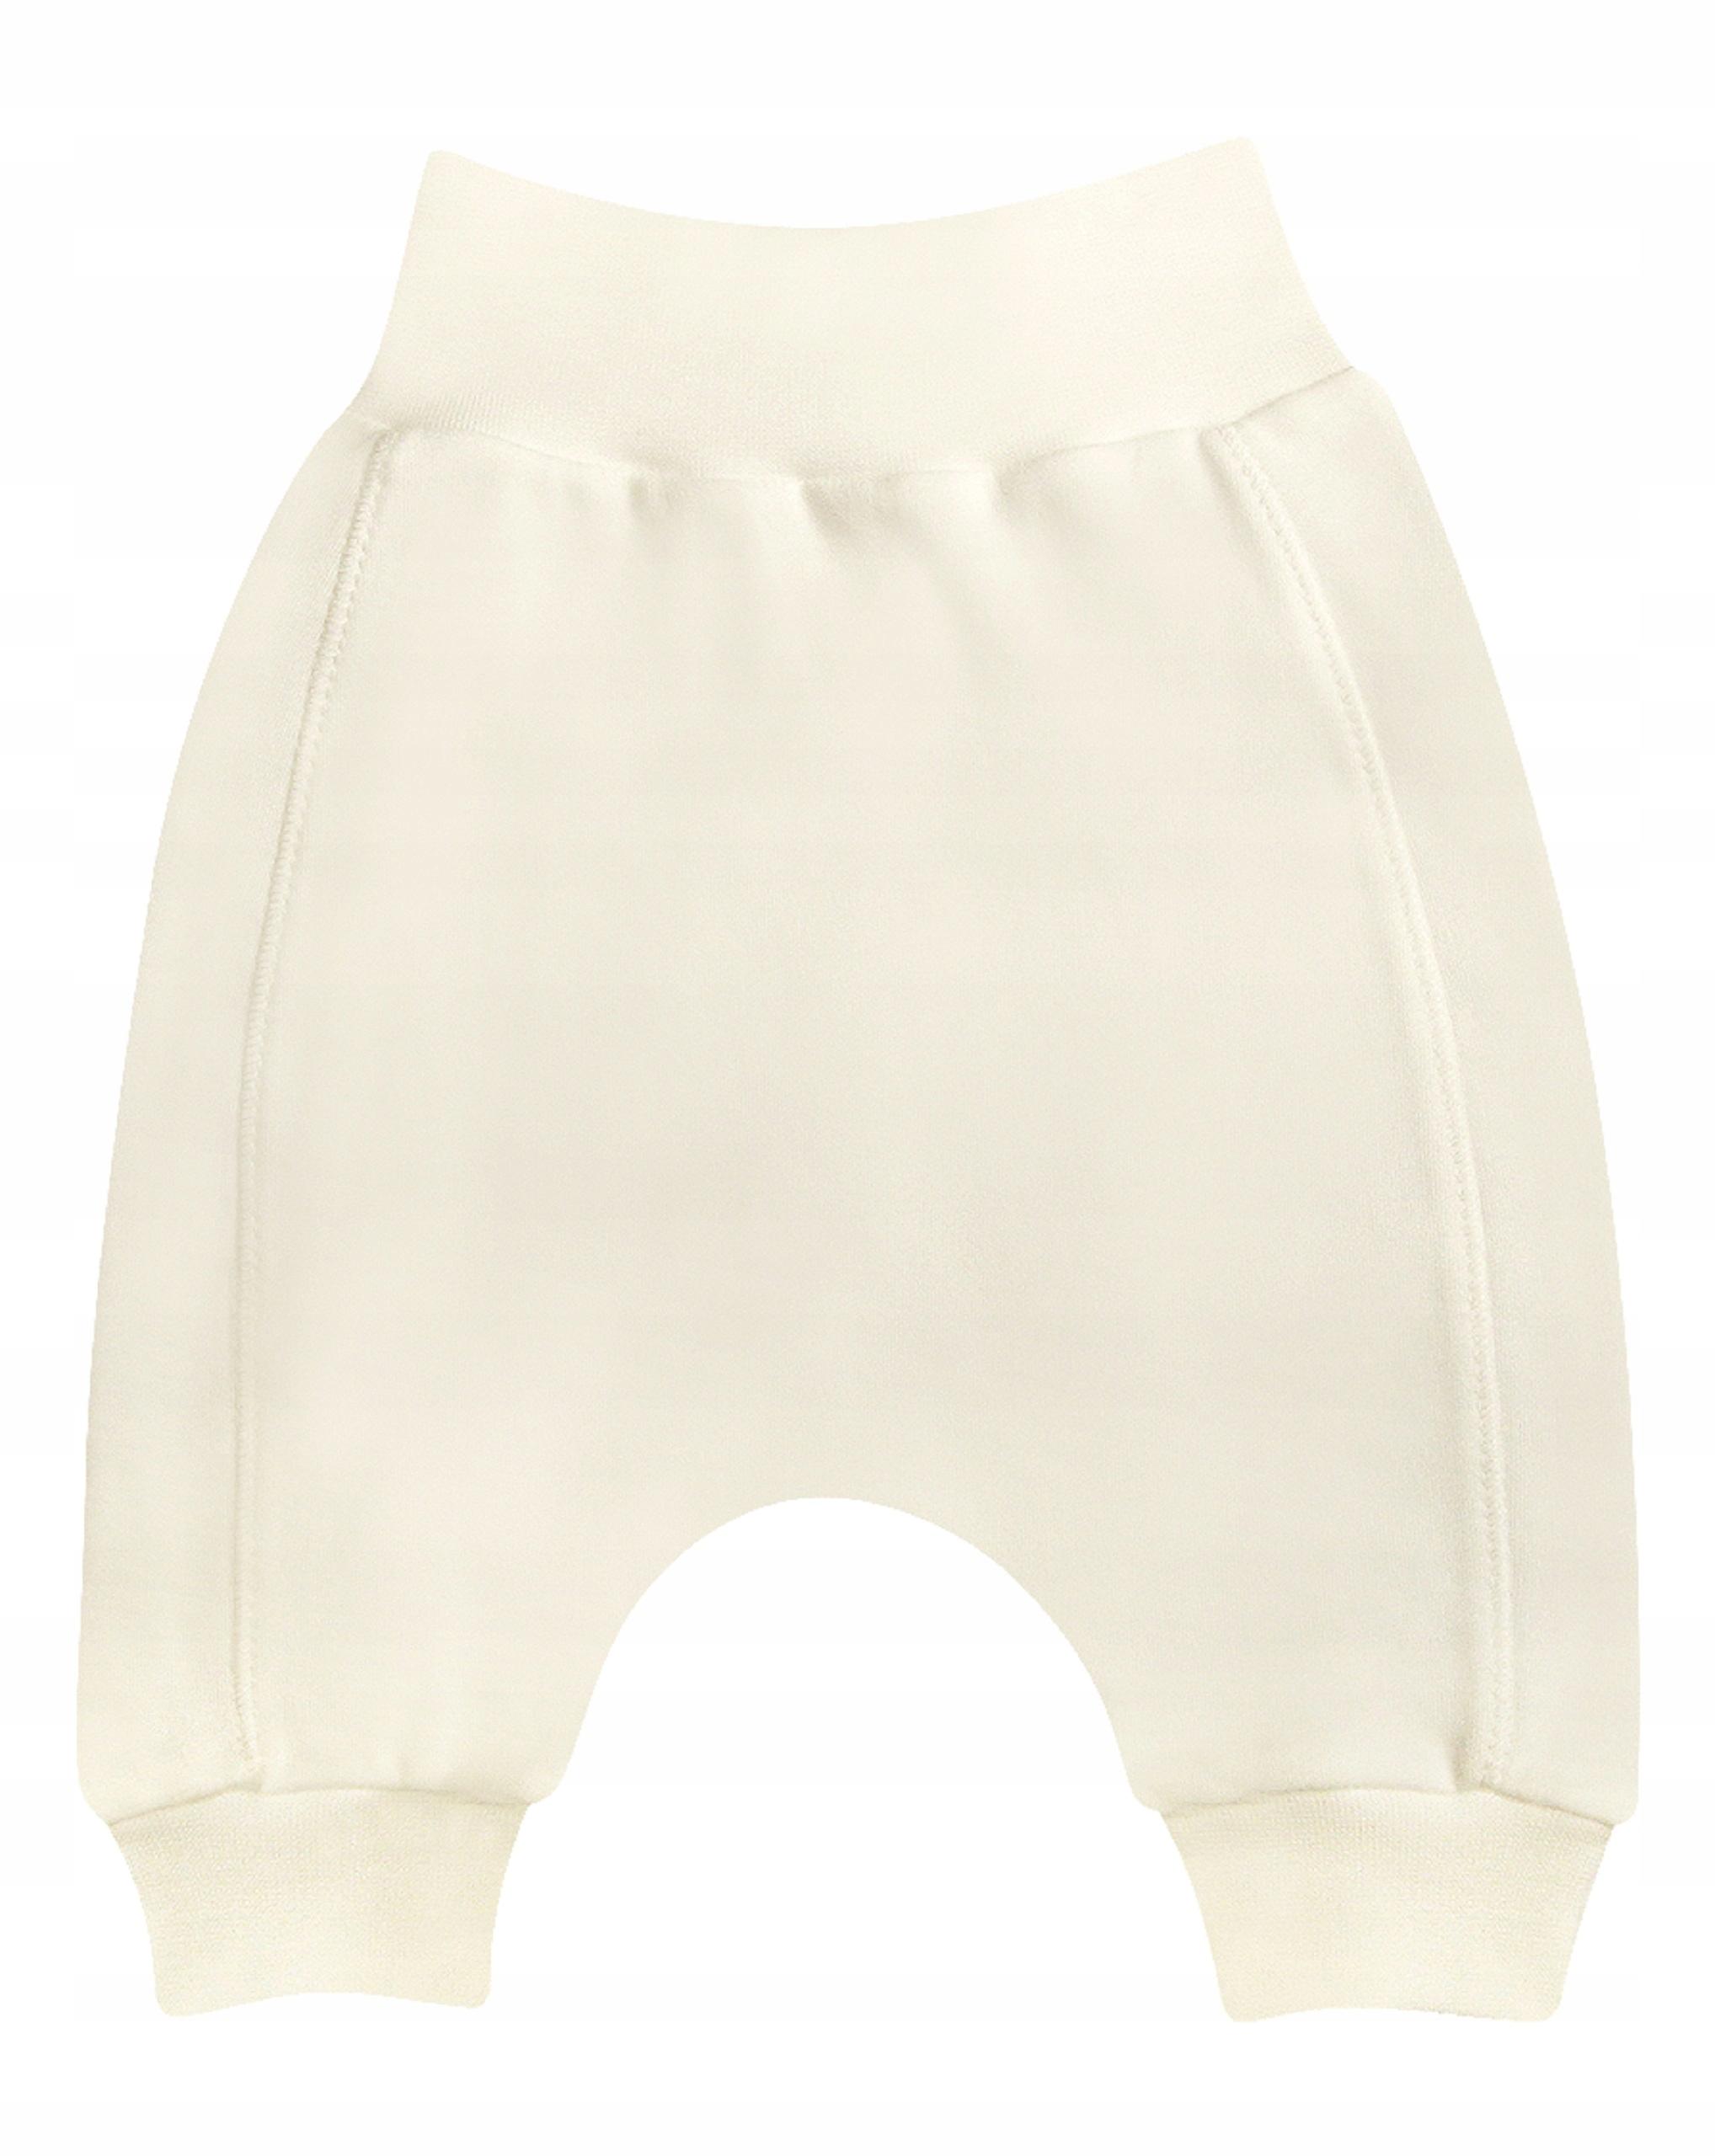 99e41dff0f280f Escallante NINI Spodnie niemowlęce ABN-0932 r.68 - 7274556436 ...